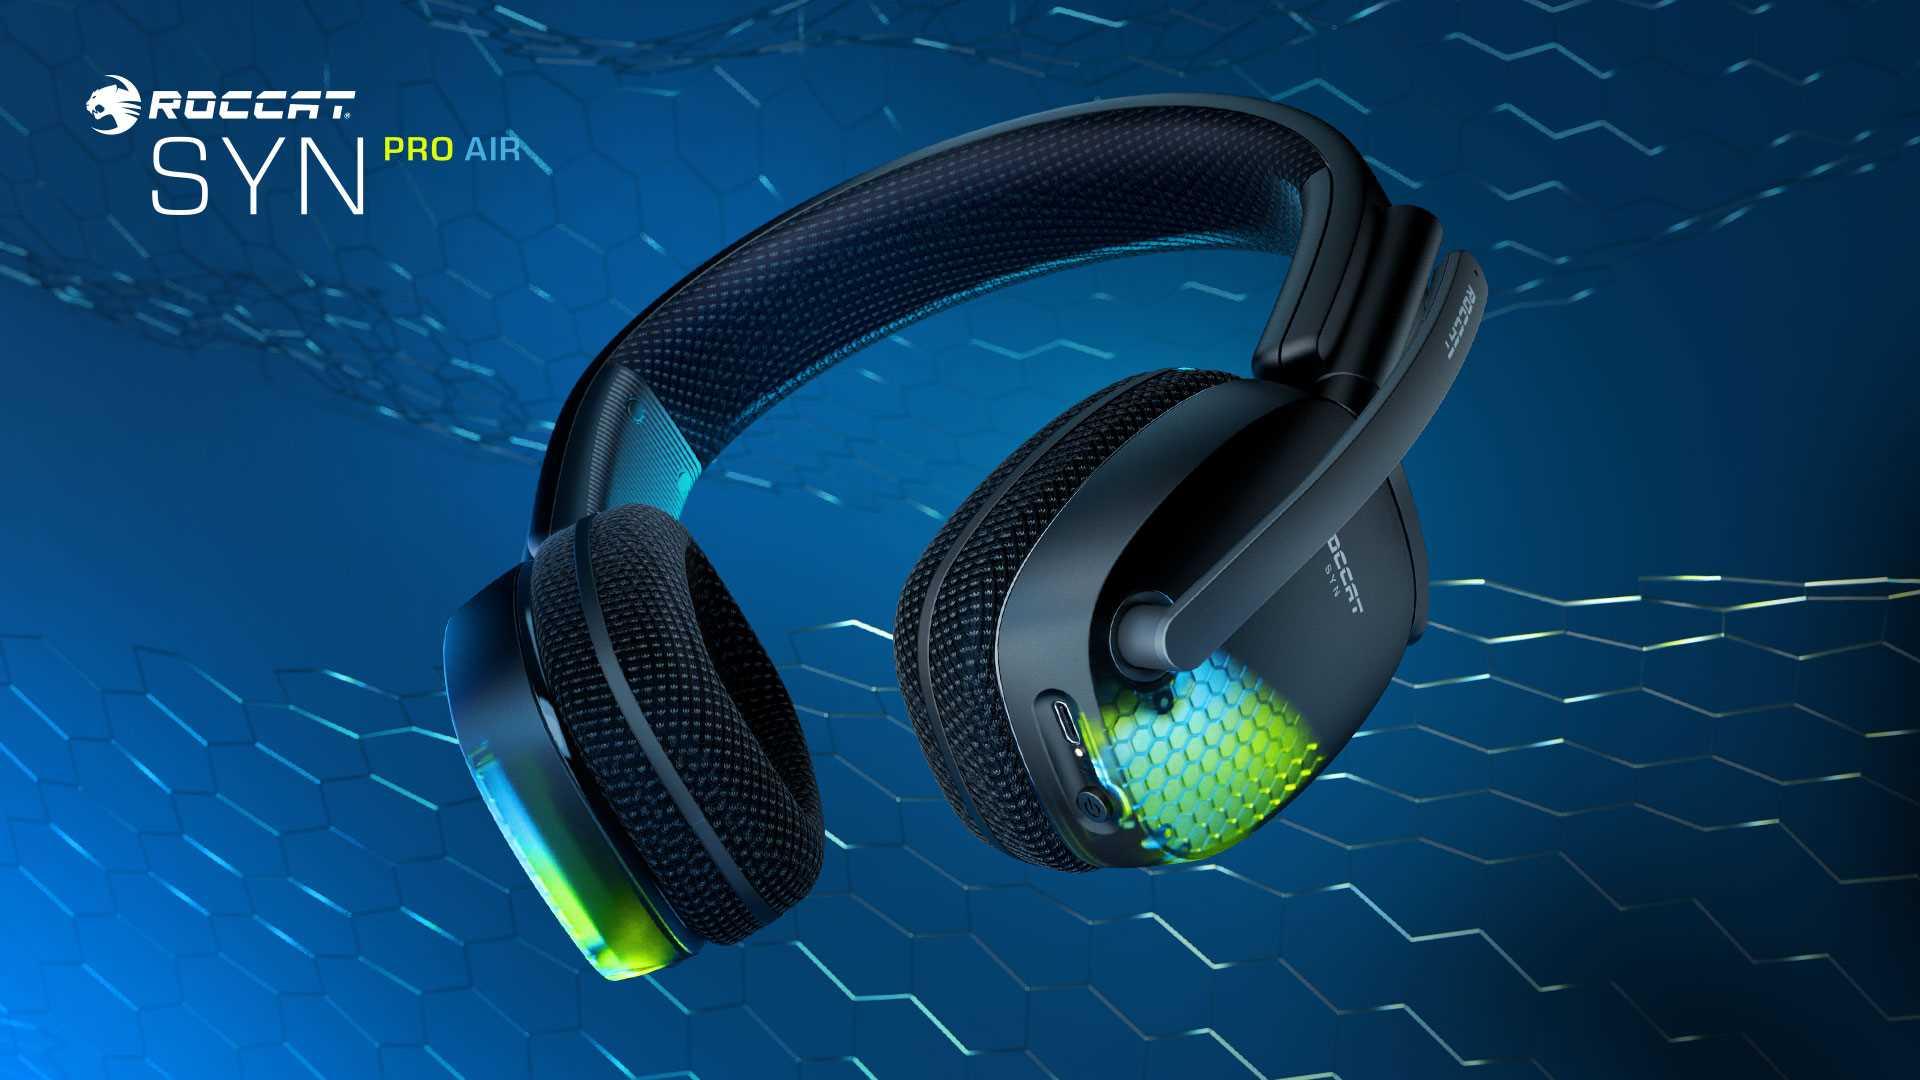 ROCCAT Syn Pro Air - das Headset